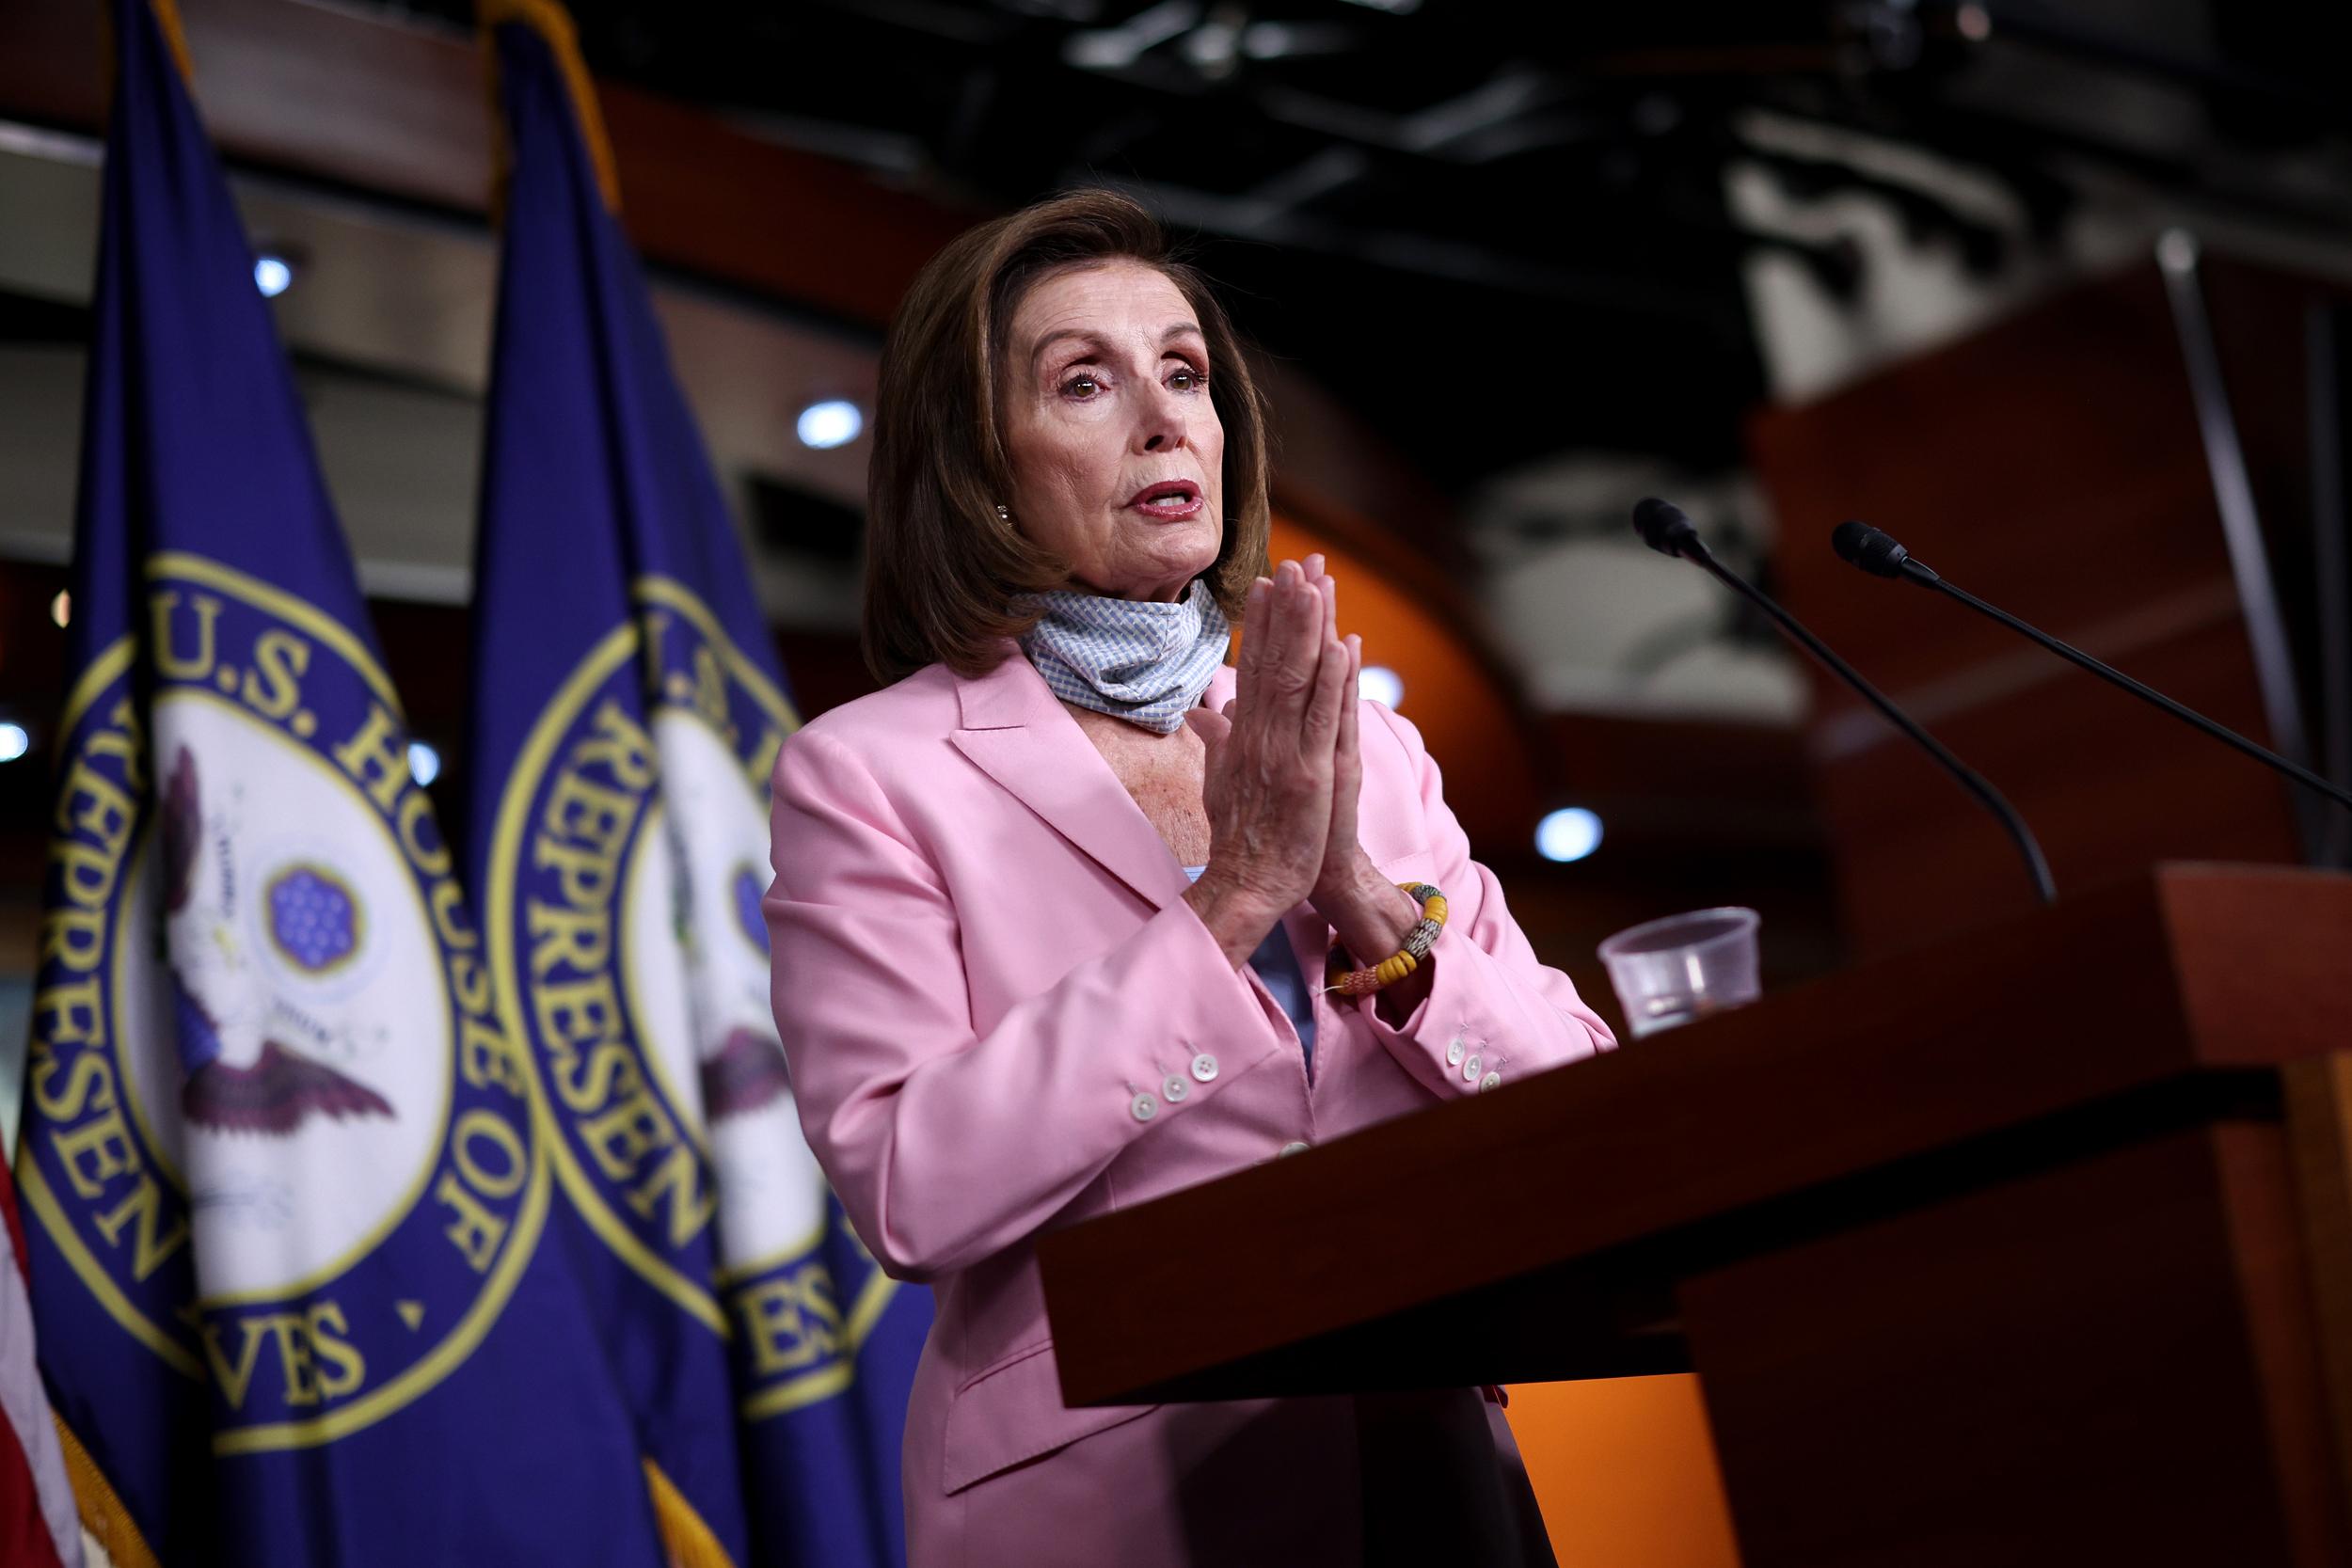 'Arbitrary and cruel': Democrats excoriate Supreme Court decision on eviction moratorium